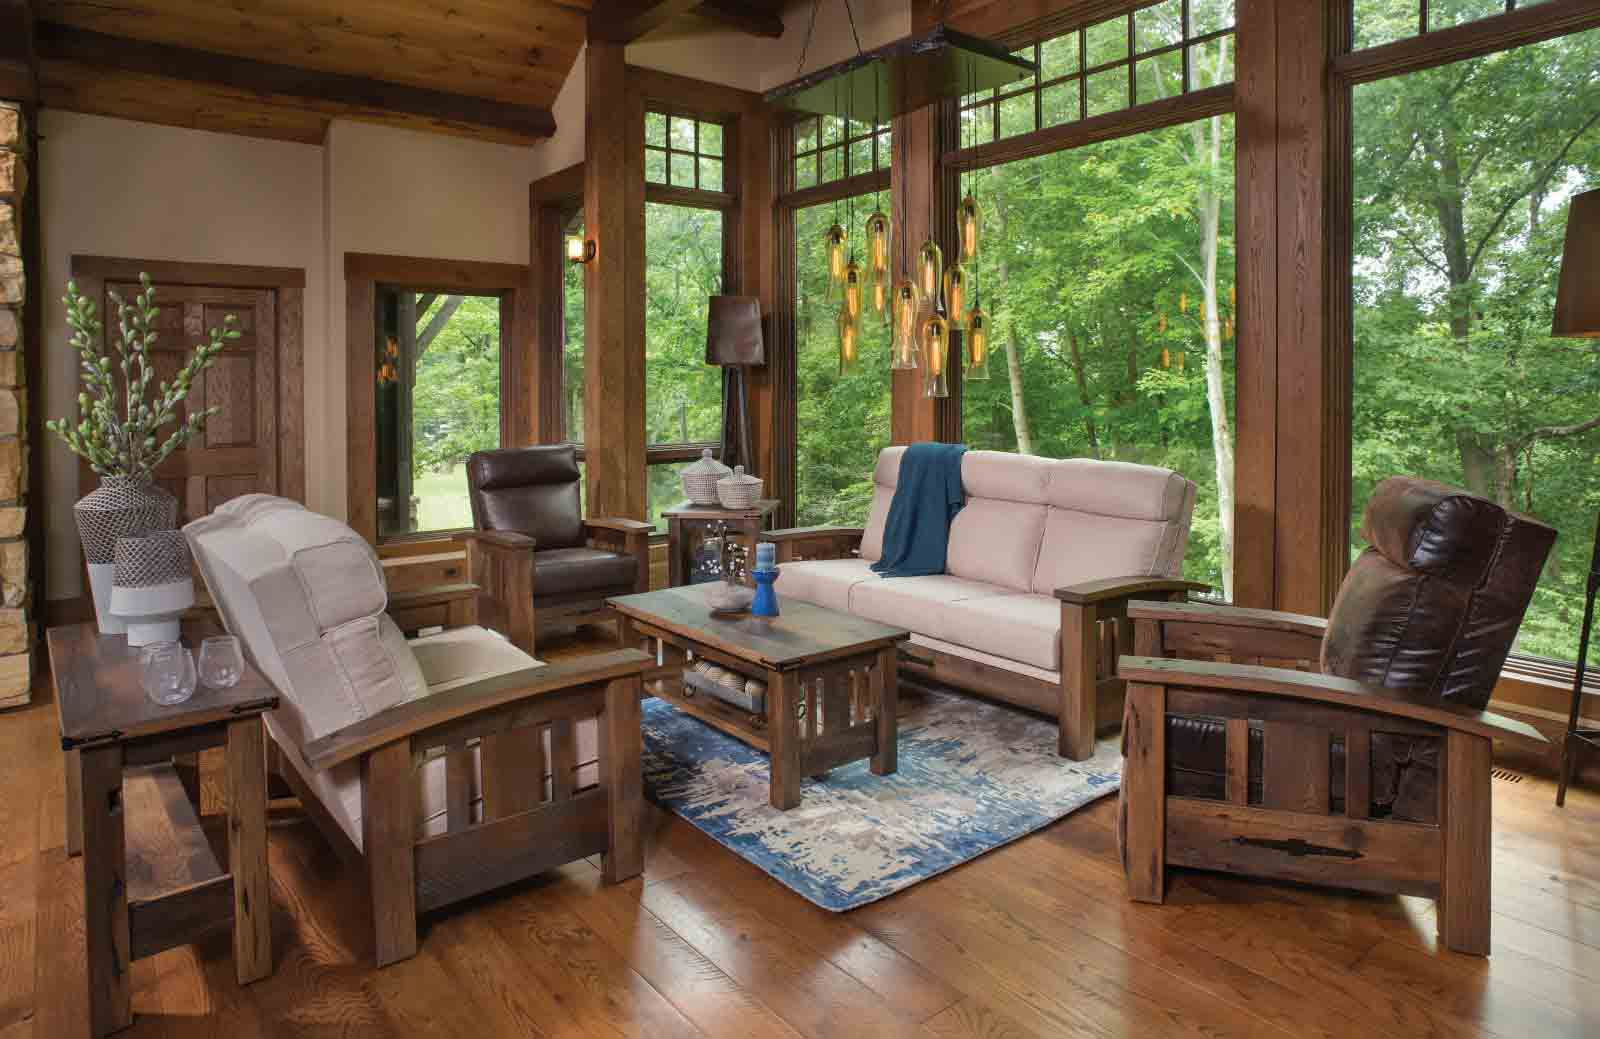 Amish Rustic Sofa Chair Love